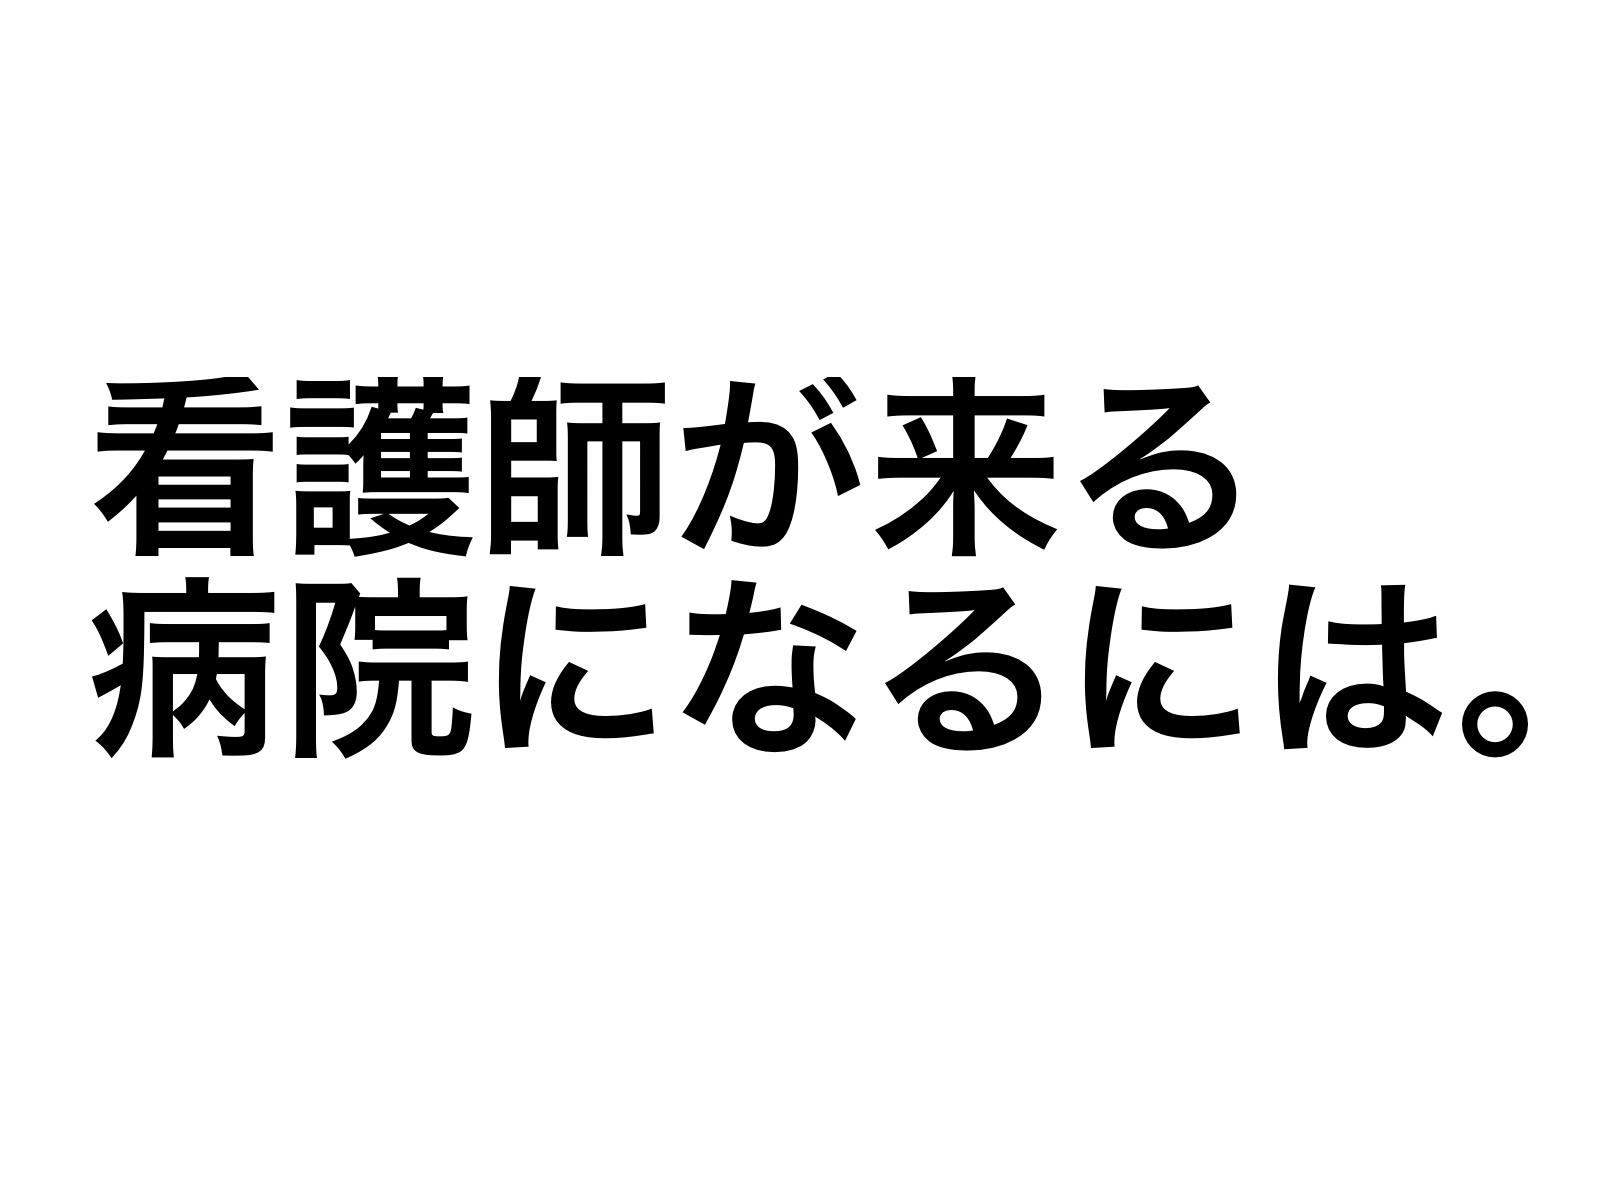 2017 05 19 19 10 26